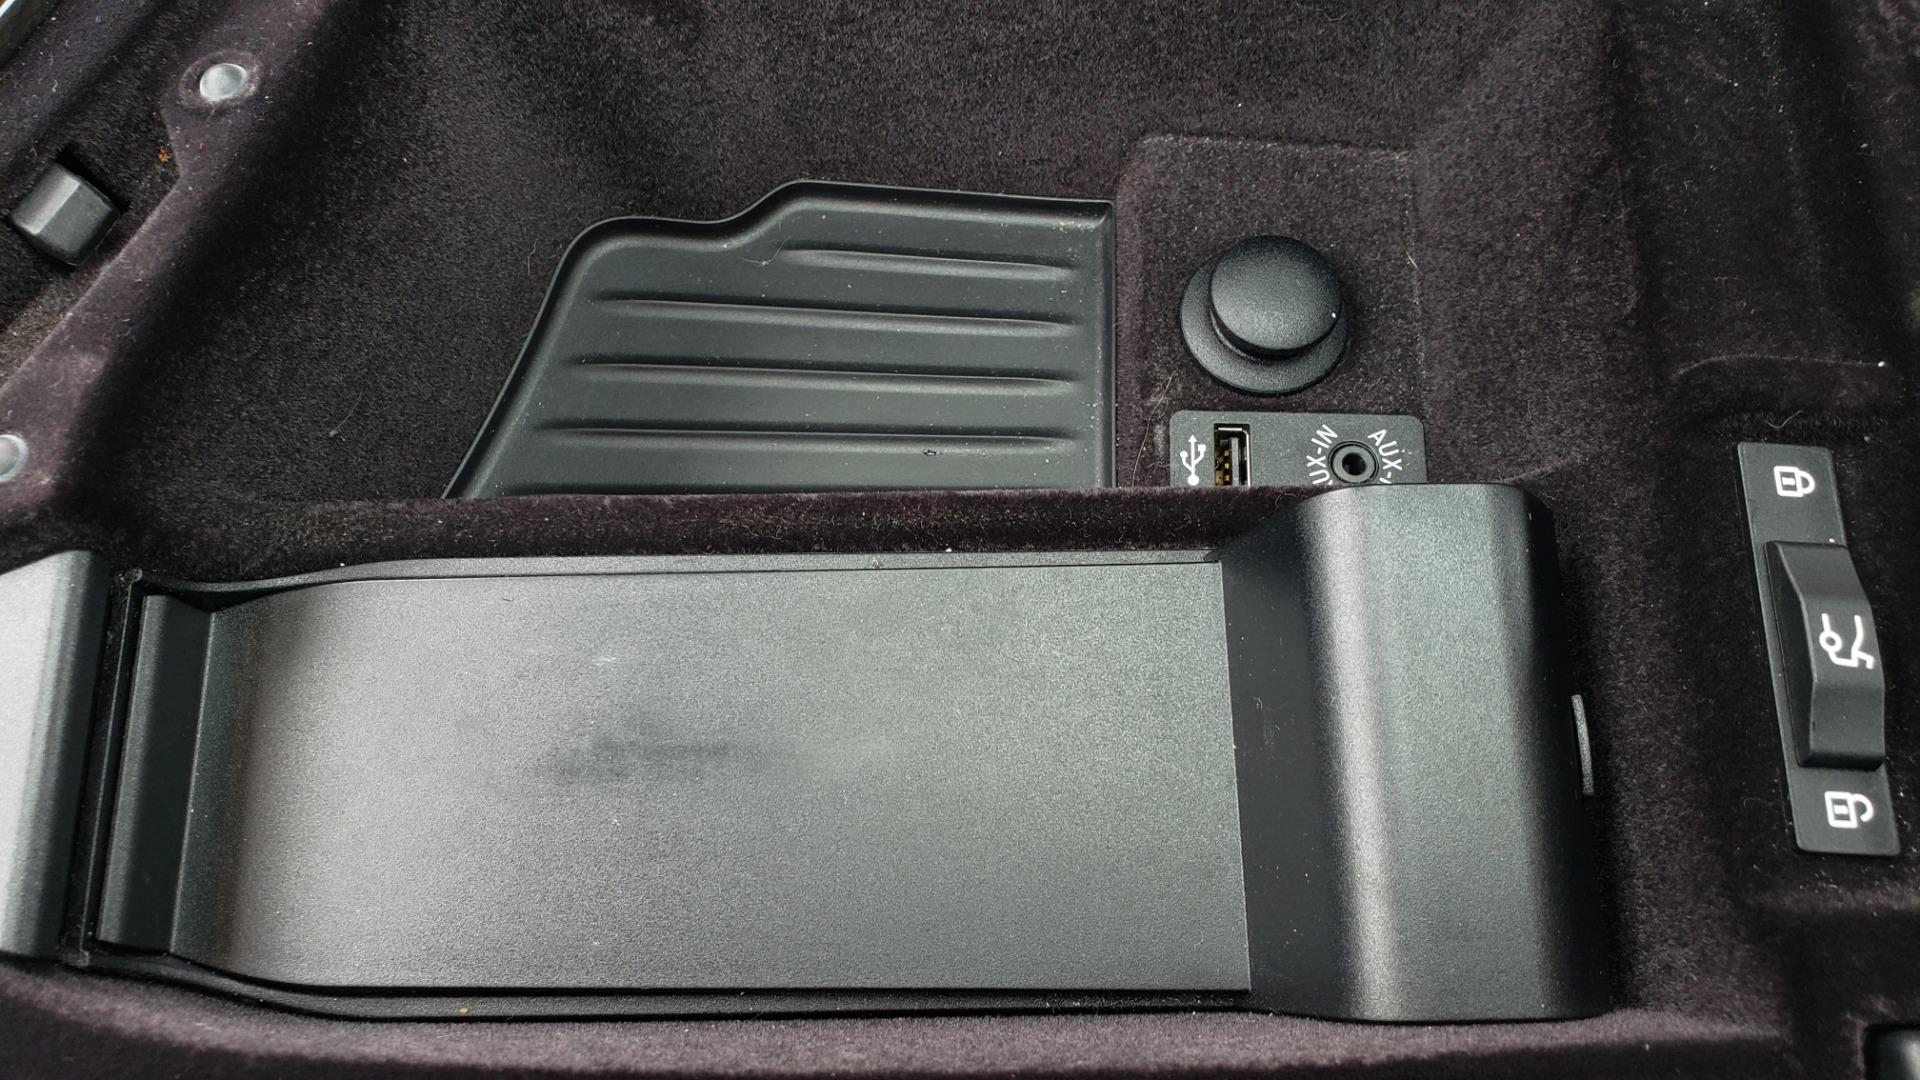 Used 2012 BMW 5 SERIES 550I M SPORT / NAV / CONV PKG / SUNROOF / PREM SND / REARVIEW for sale Sold at Formula Imports in Charlotte NC 28227 48